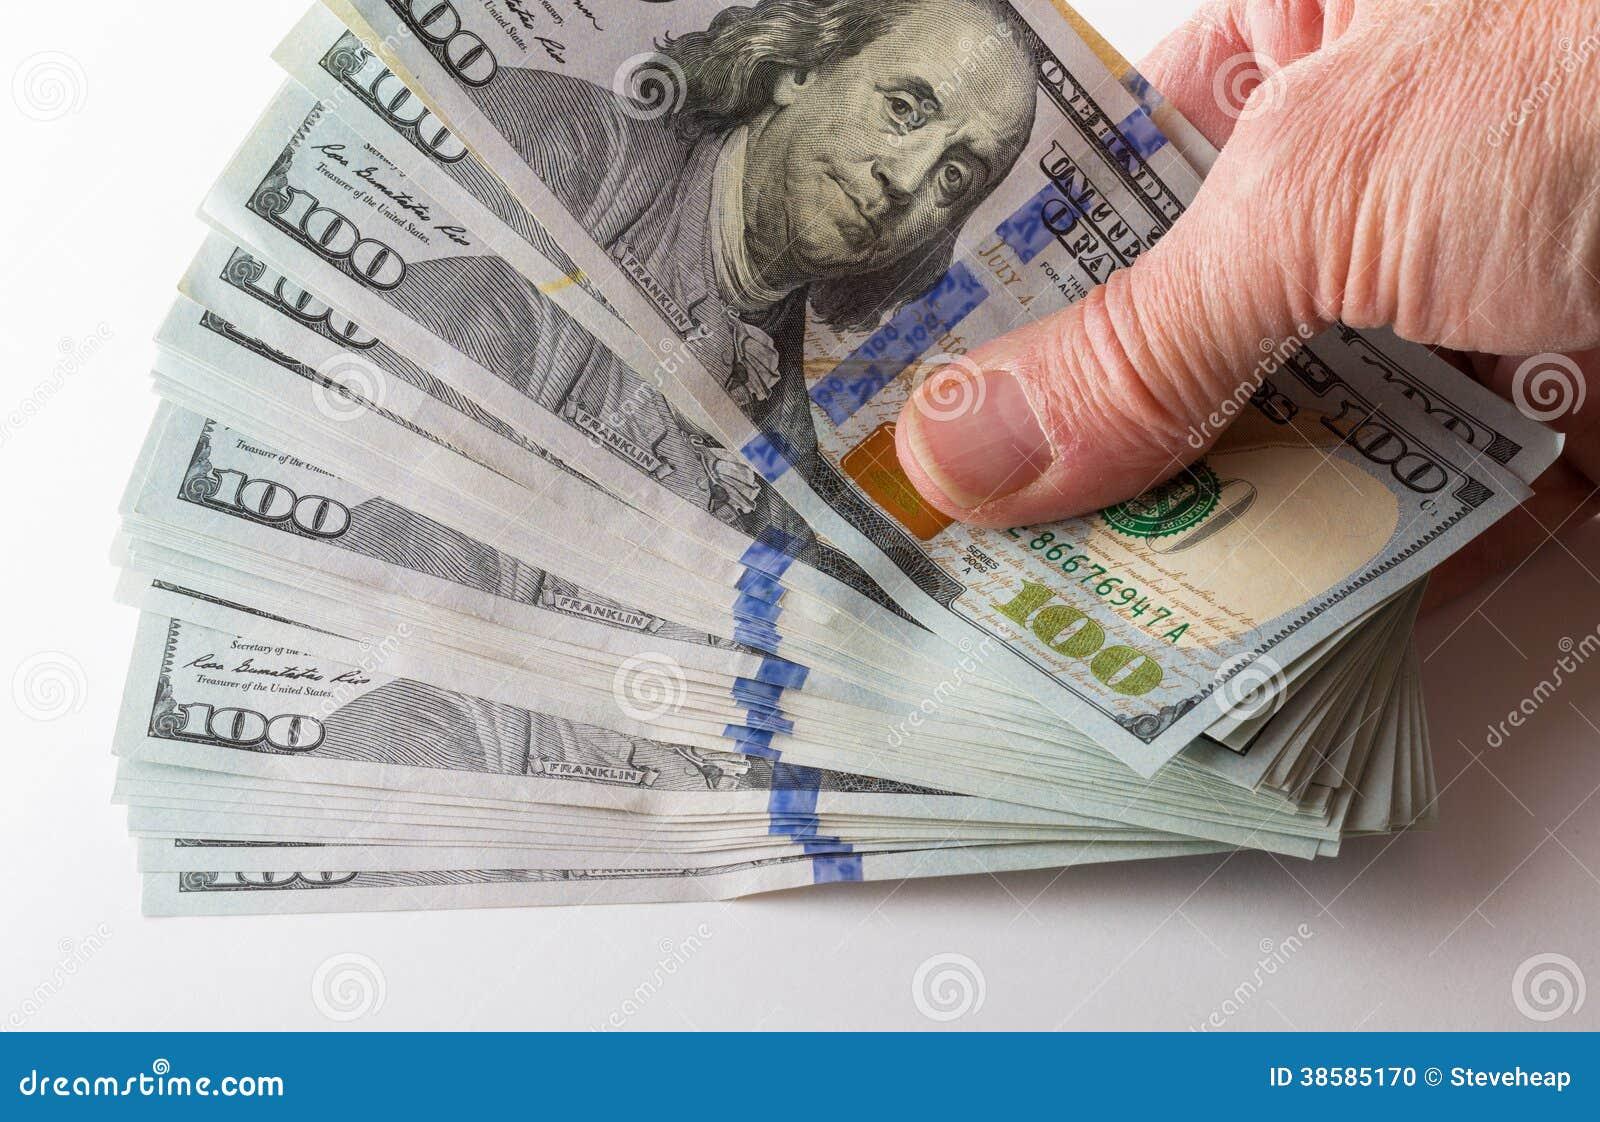 New Design 100 Dollar US Bills Or Notes Stock Photo - Image: 38585170